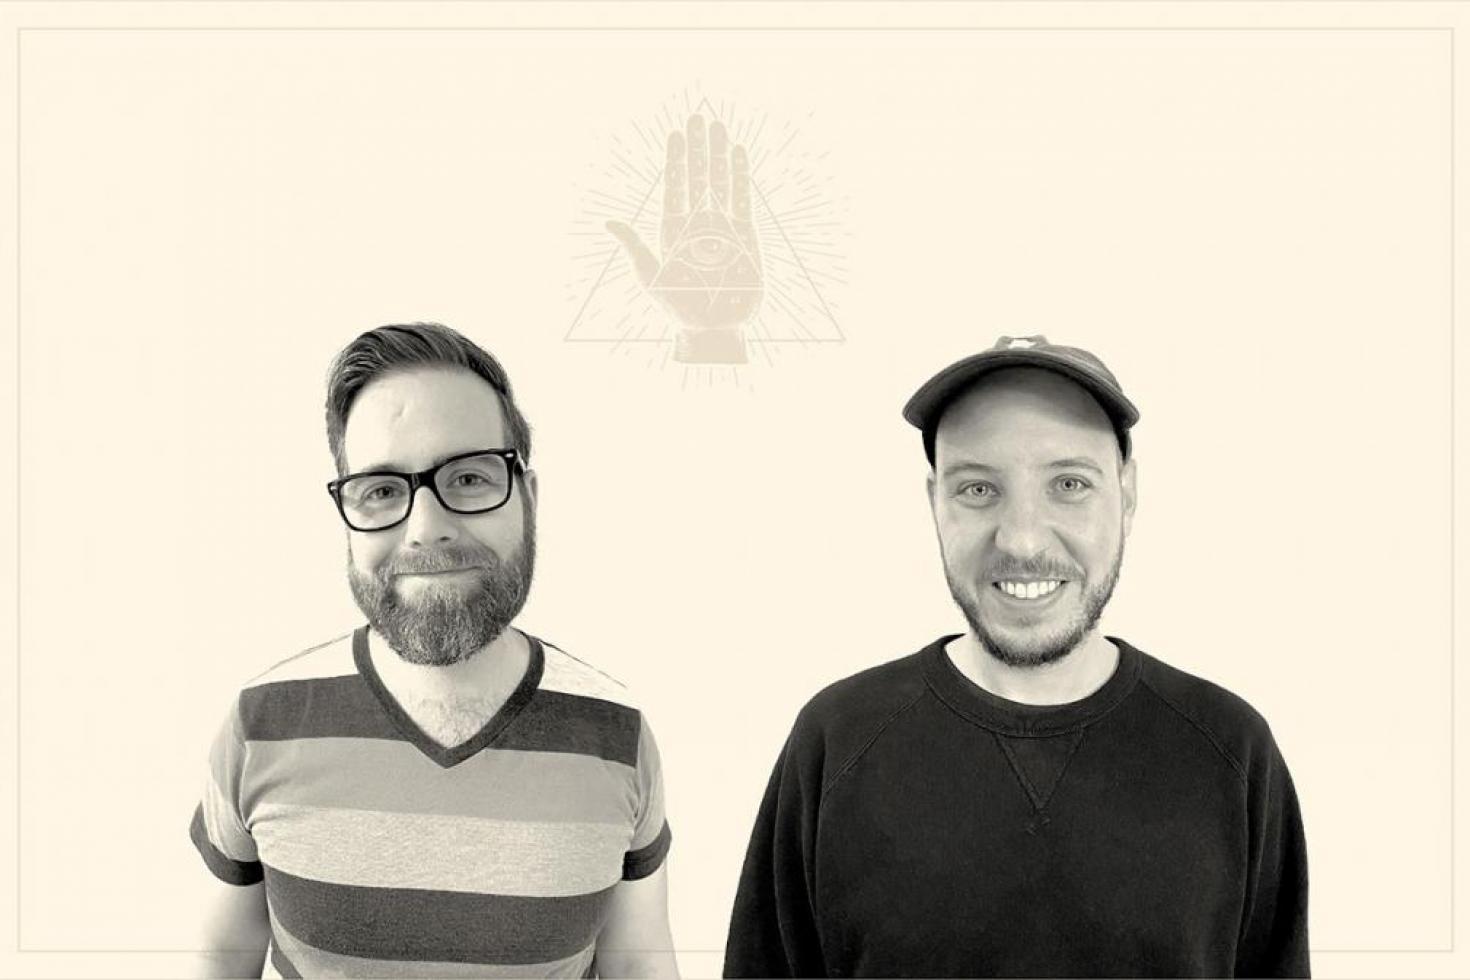 Track-by-track: En Garde's Ross Horvath about 'Debtors'